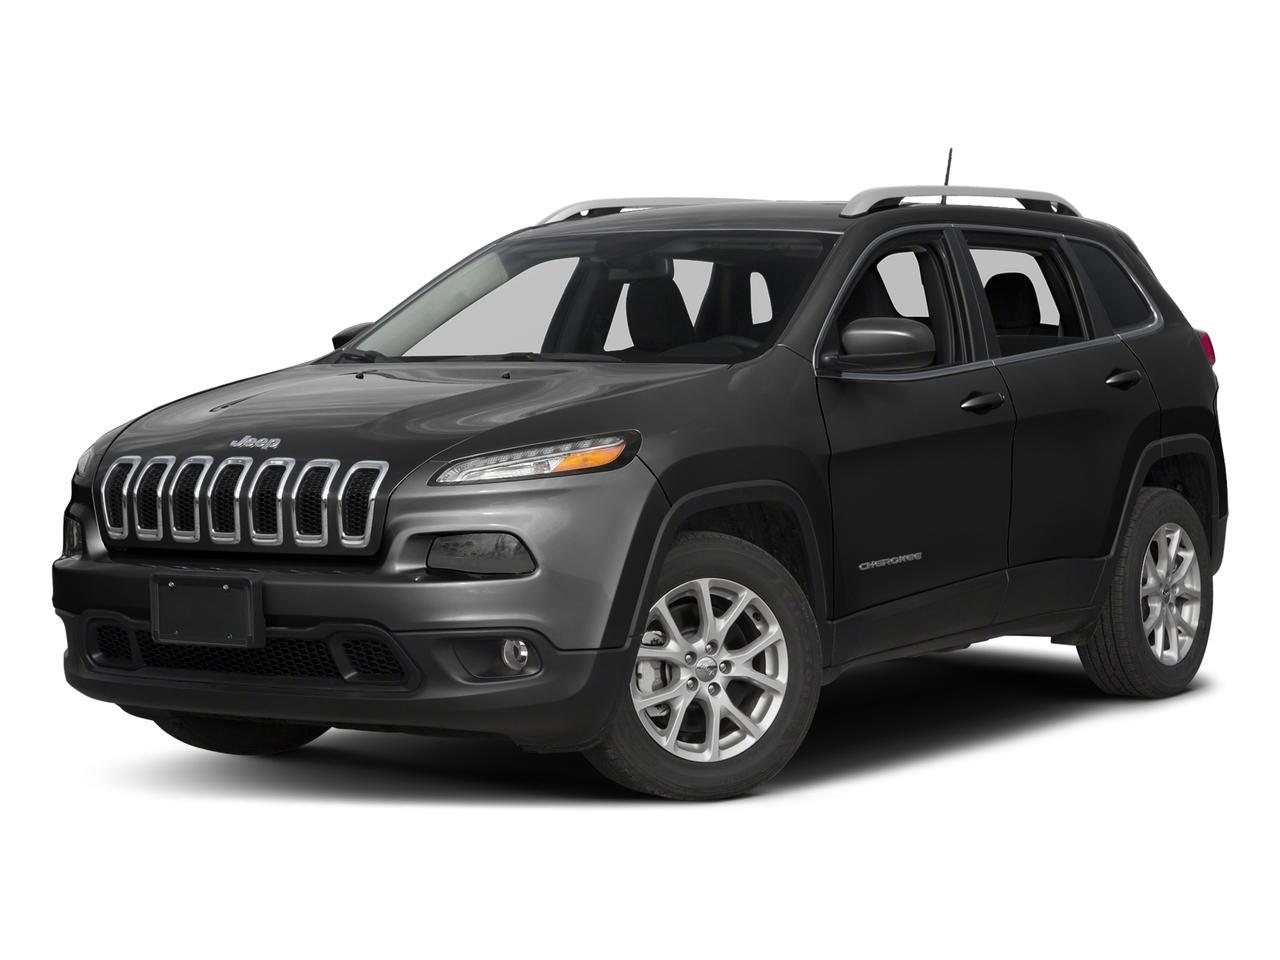 2017 Jeep Cherokee Vehicle Photo in Beaufort, SC 29906